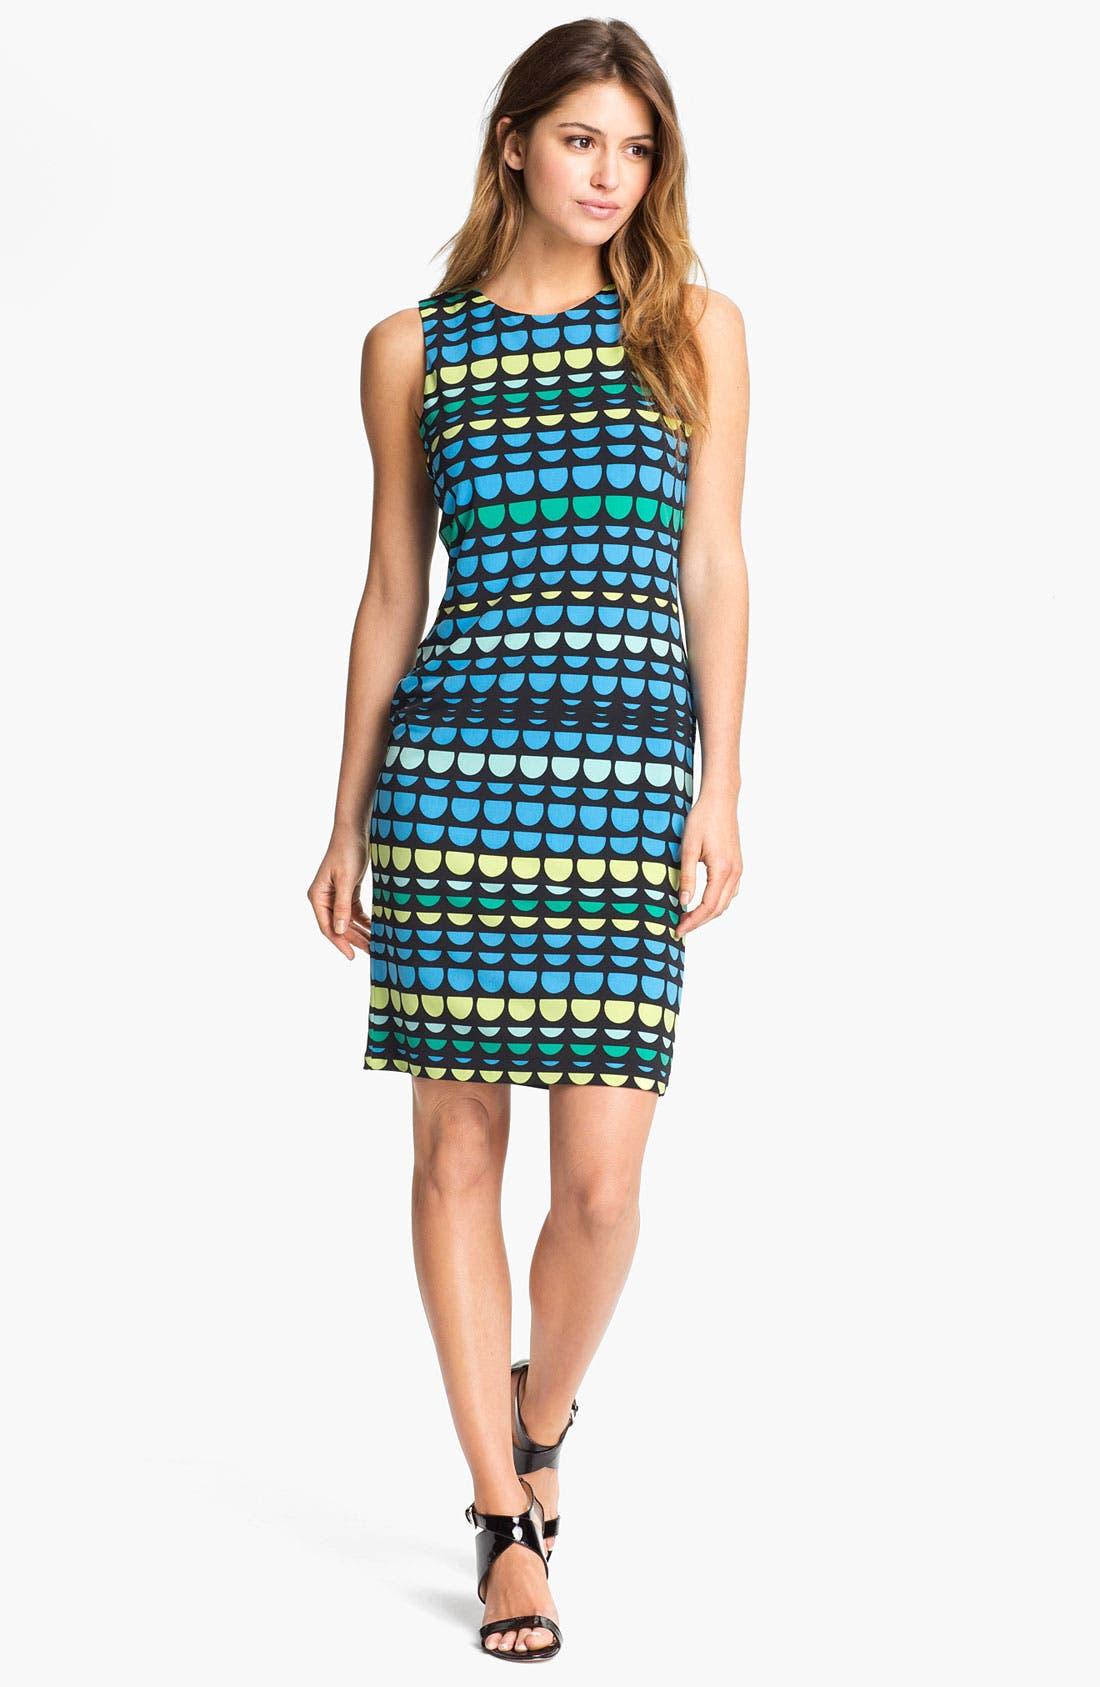 Alternate Image 1 Selected - Vince Camuto Semi Circle Print Sleeveless Dress